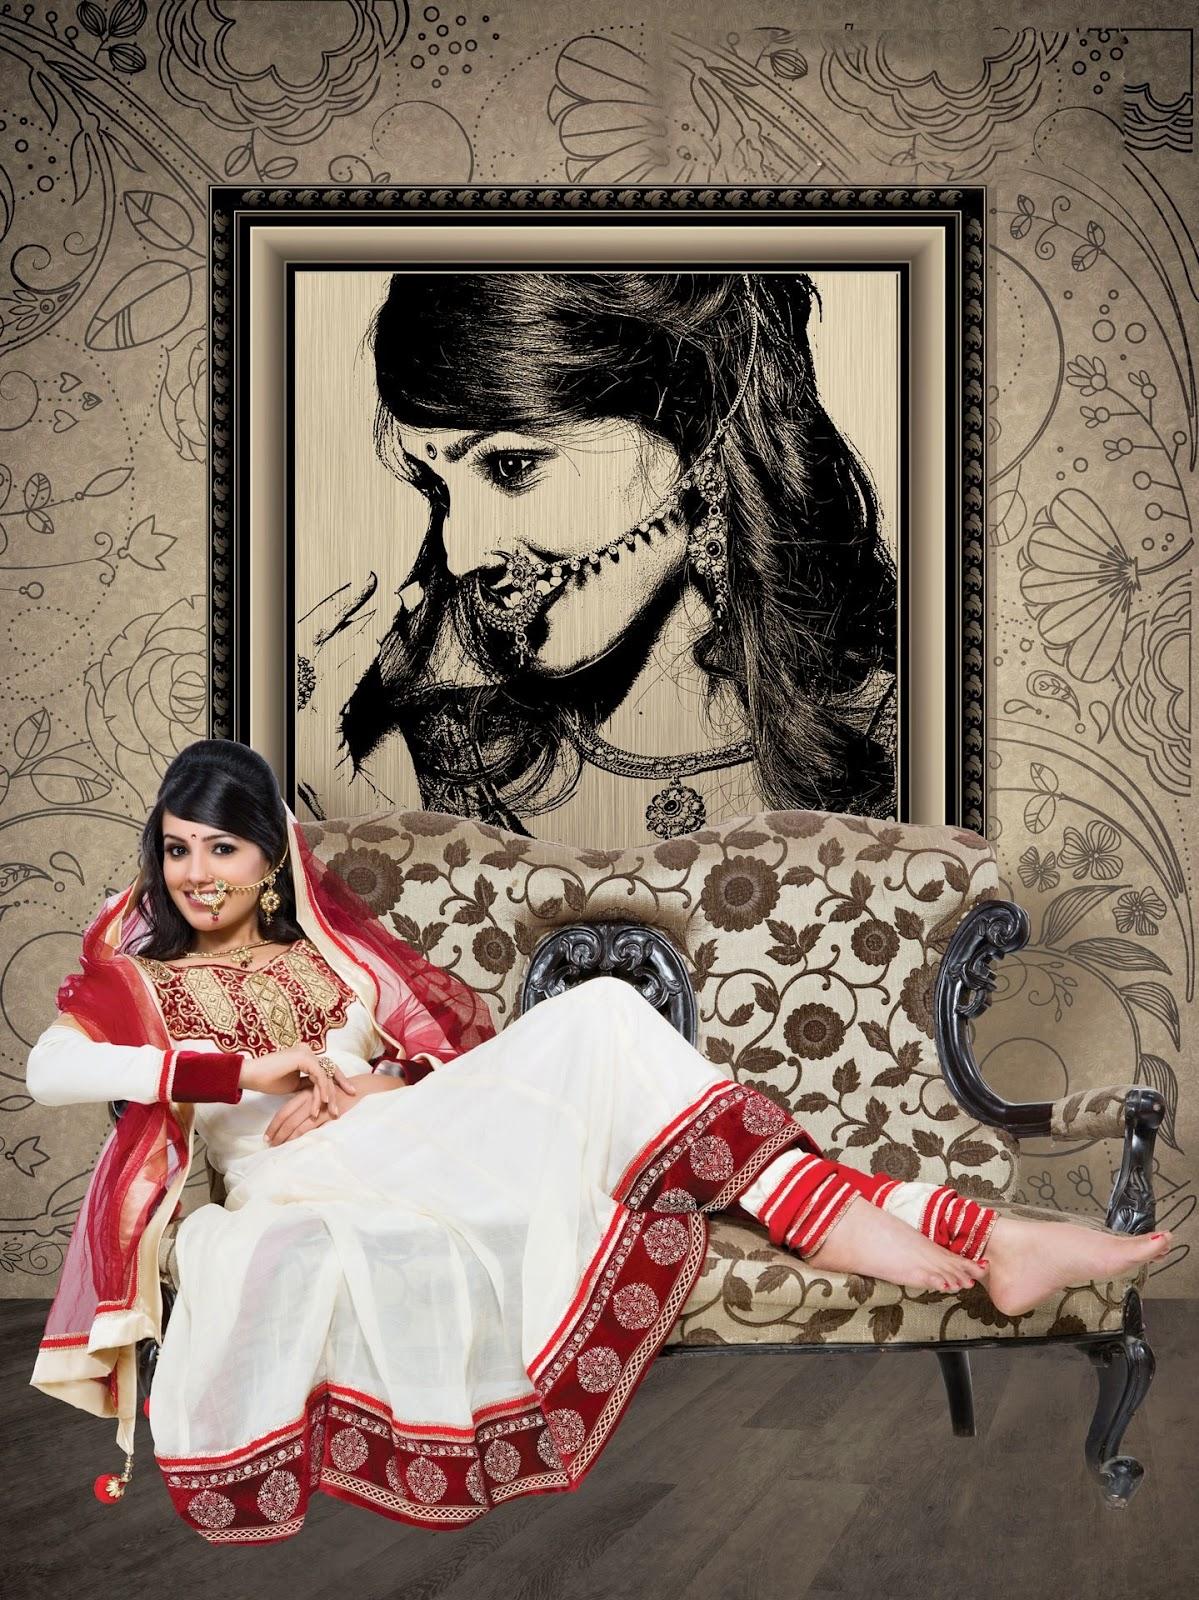 Anita Hassanandani Wallpapers Free Download